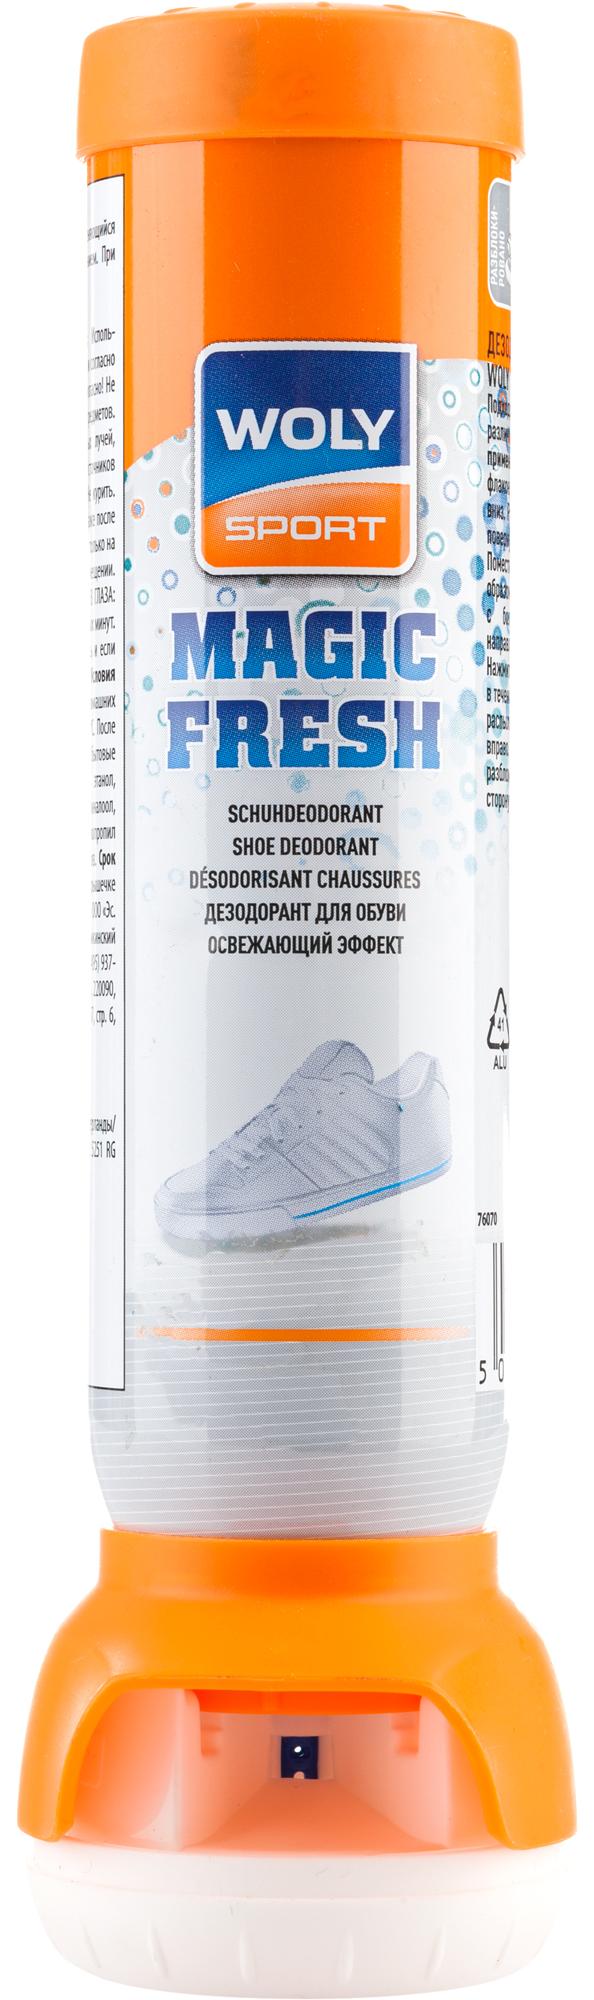 Woly Дезодорант для обуви Woly Sport, 100 мл дезодорант hlavin дезодорант спрей для обуви